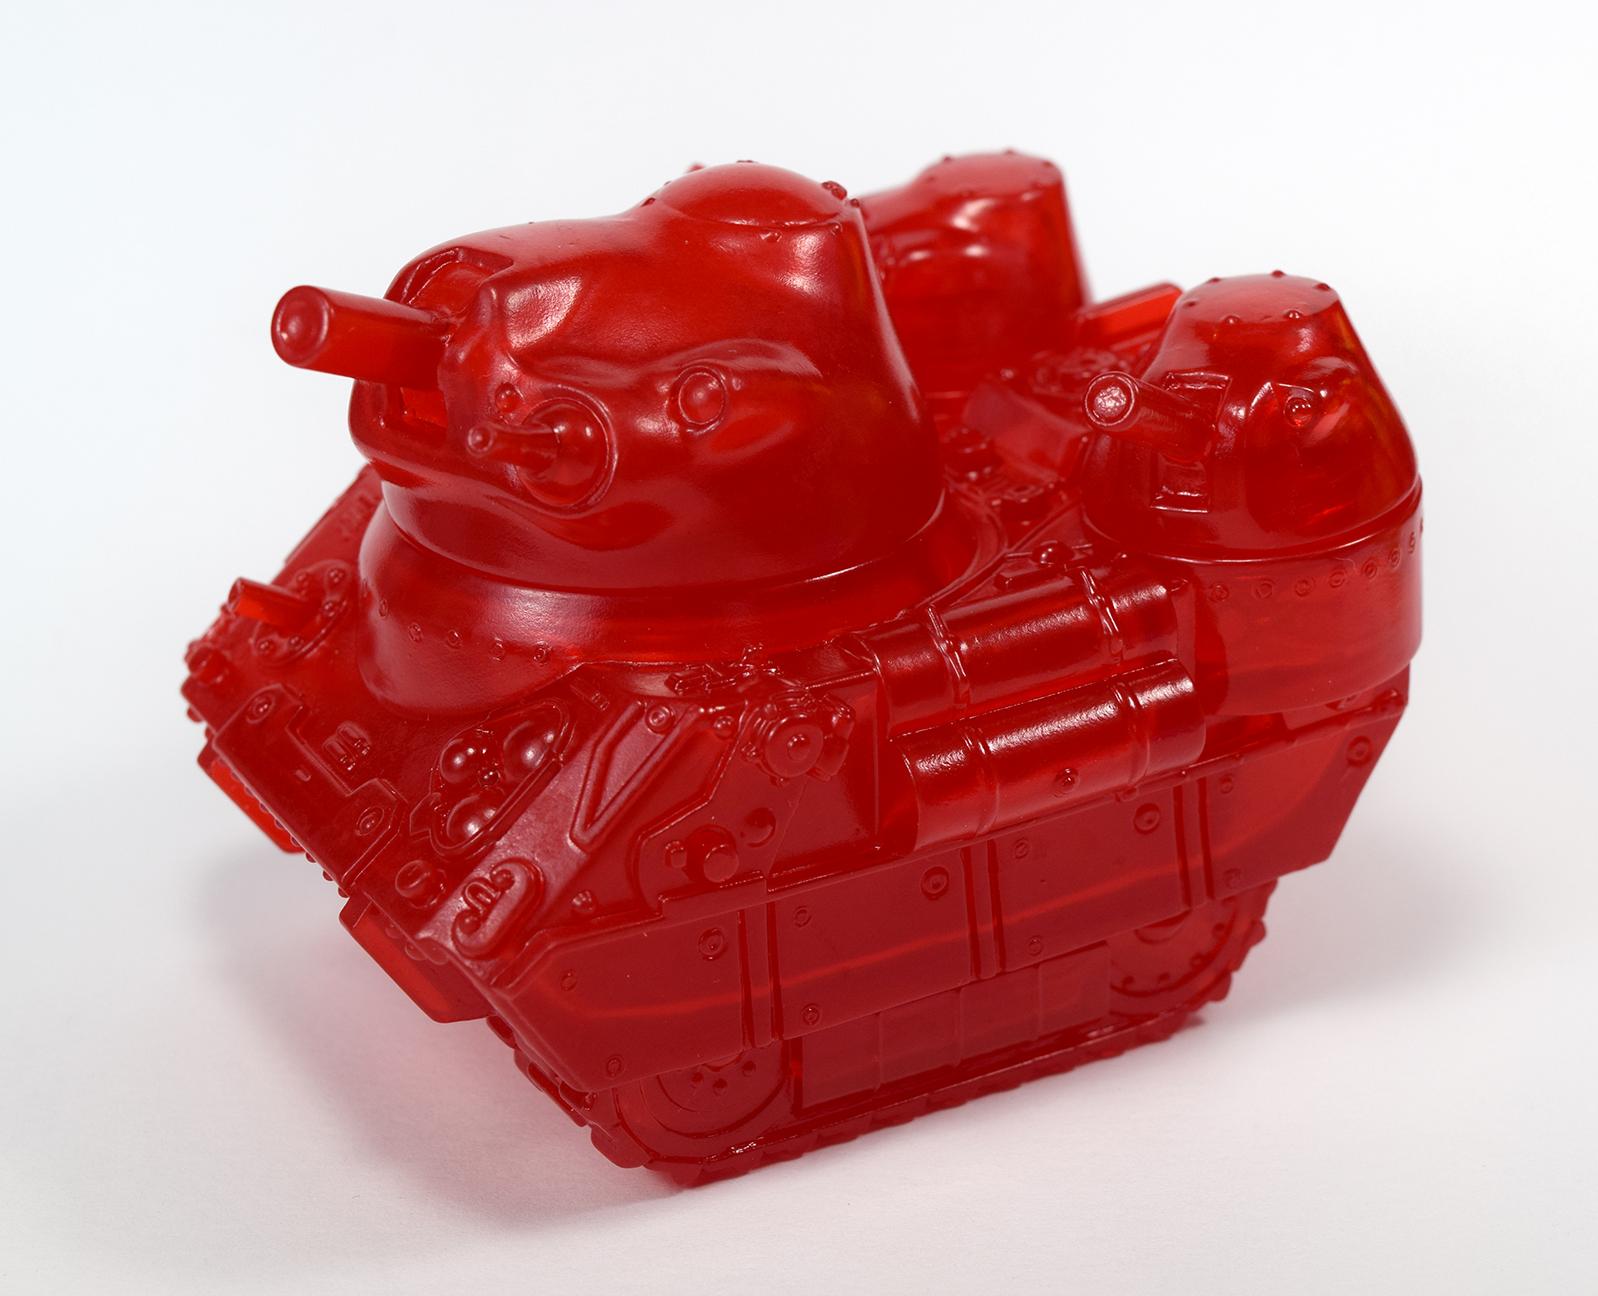 kaiju Tank sofubi clear Red version